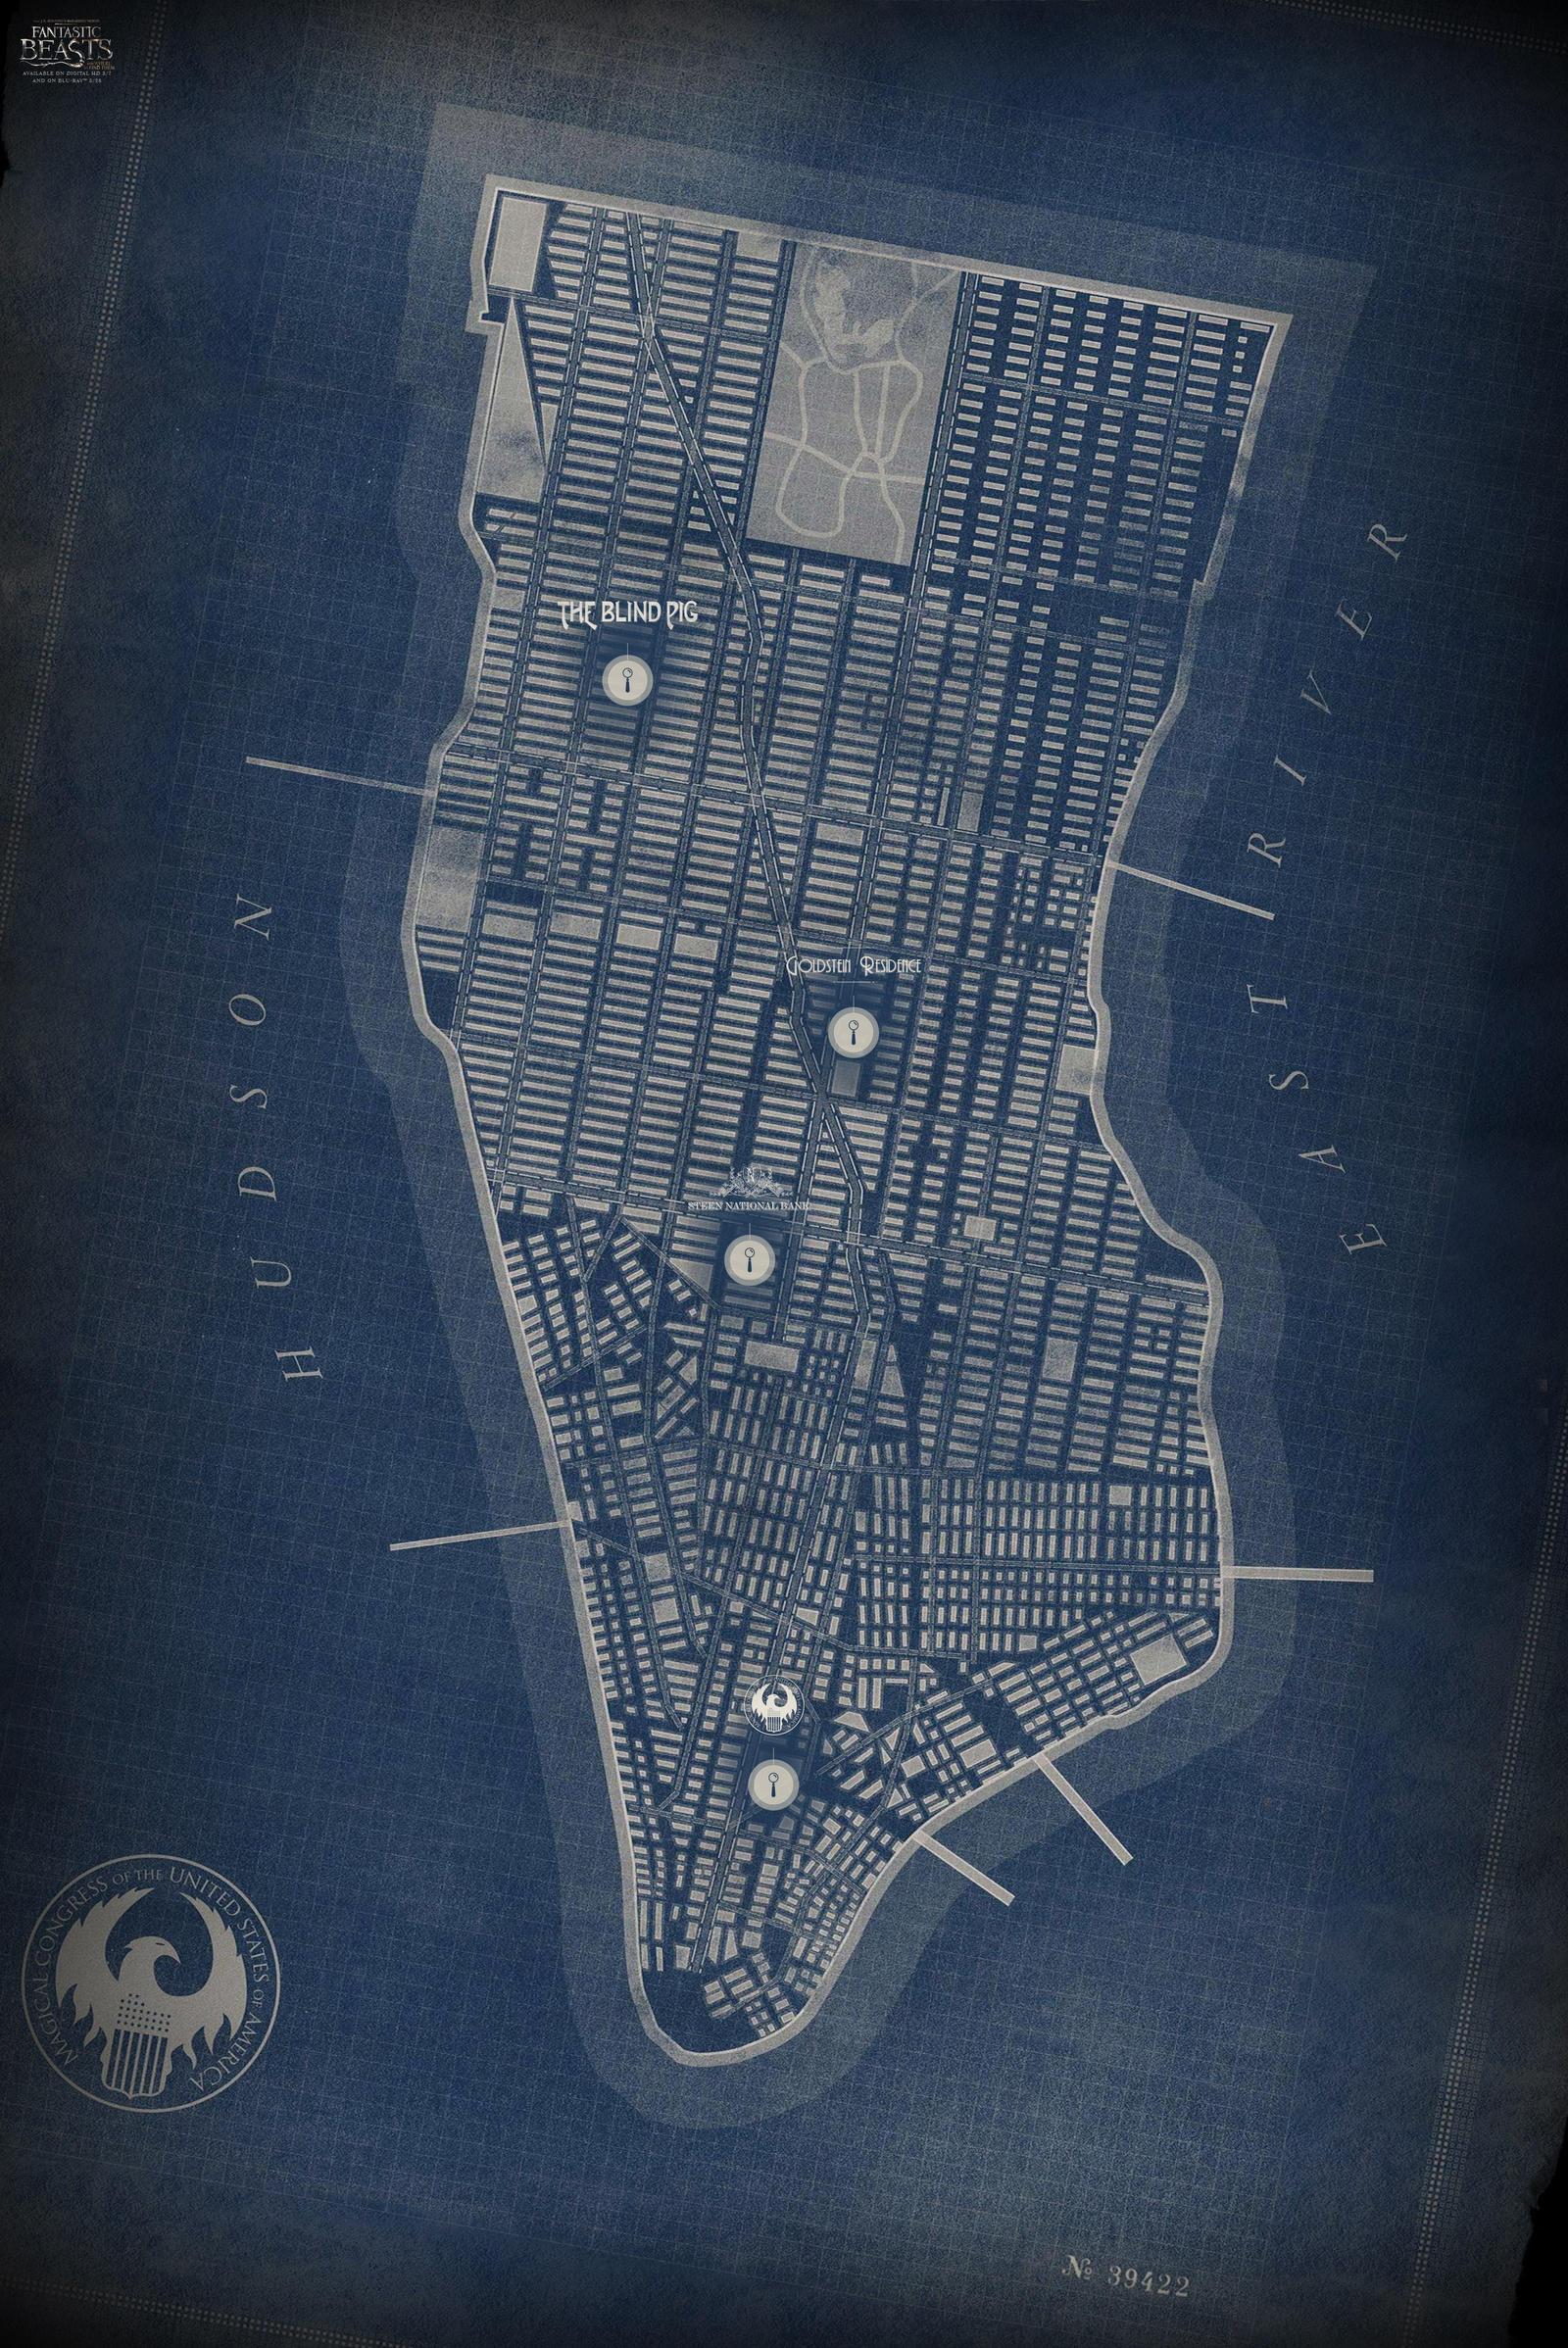 Map of Manhattan in New York City by Pavasara-Dvesma